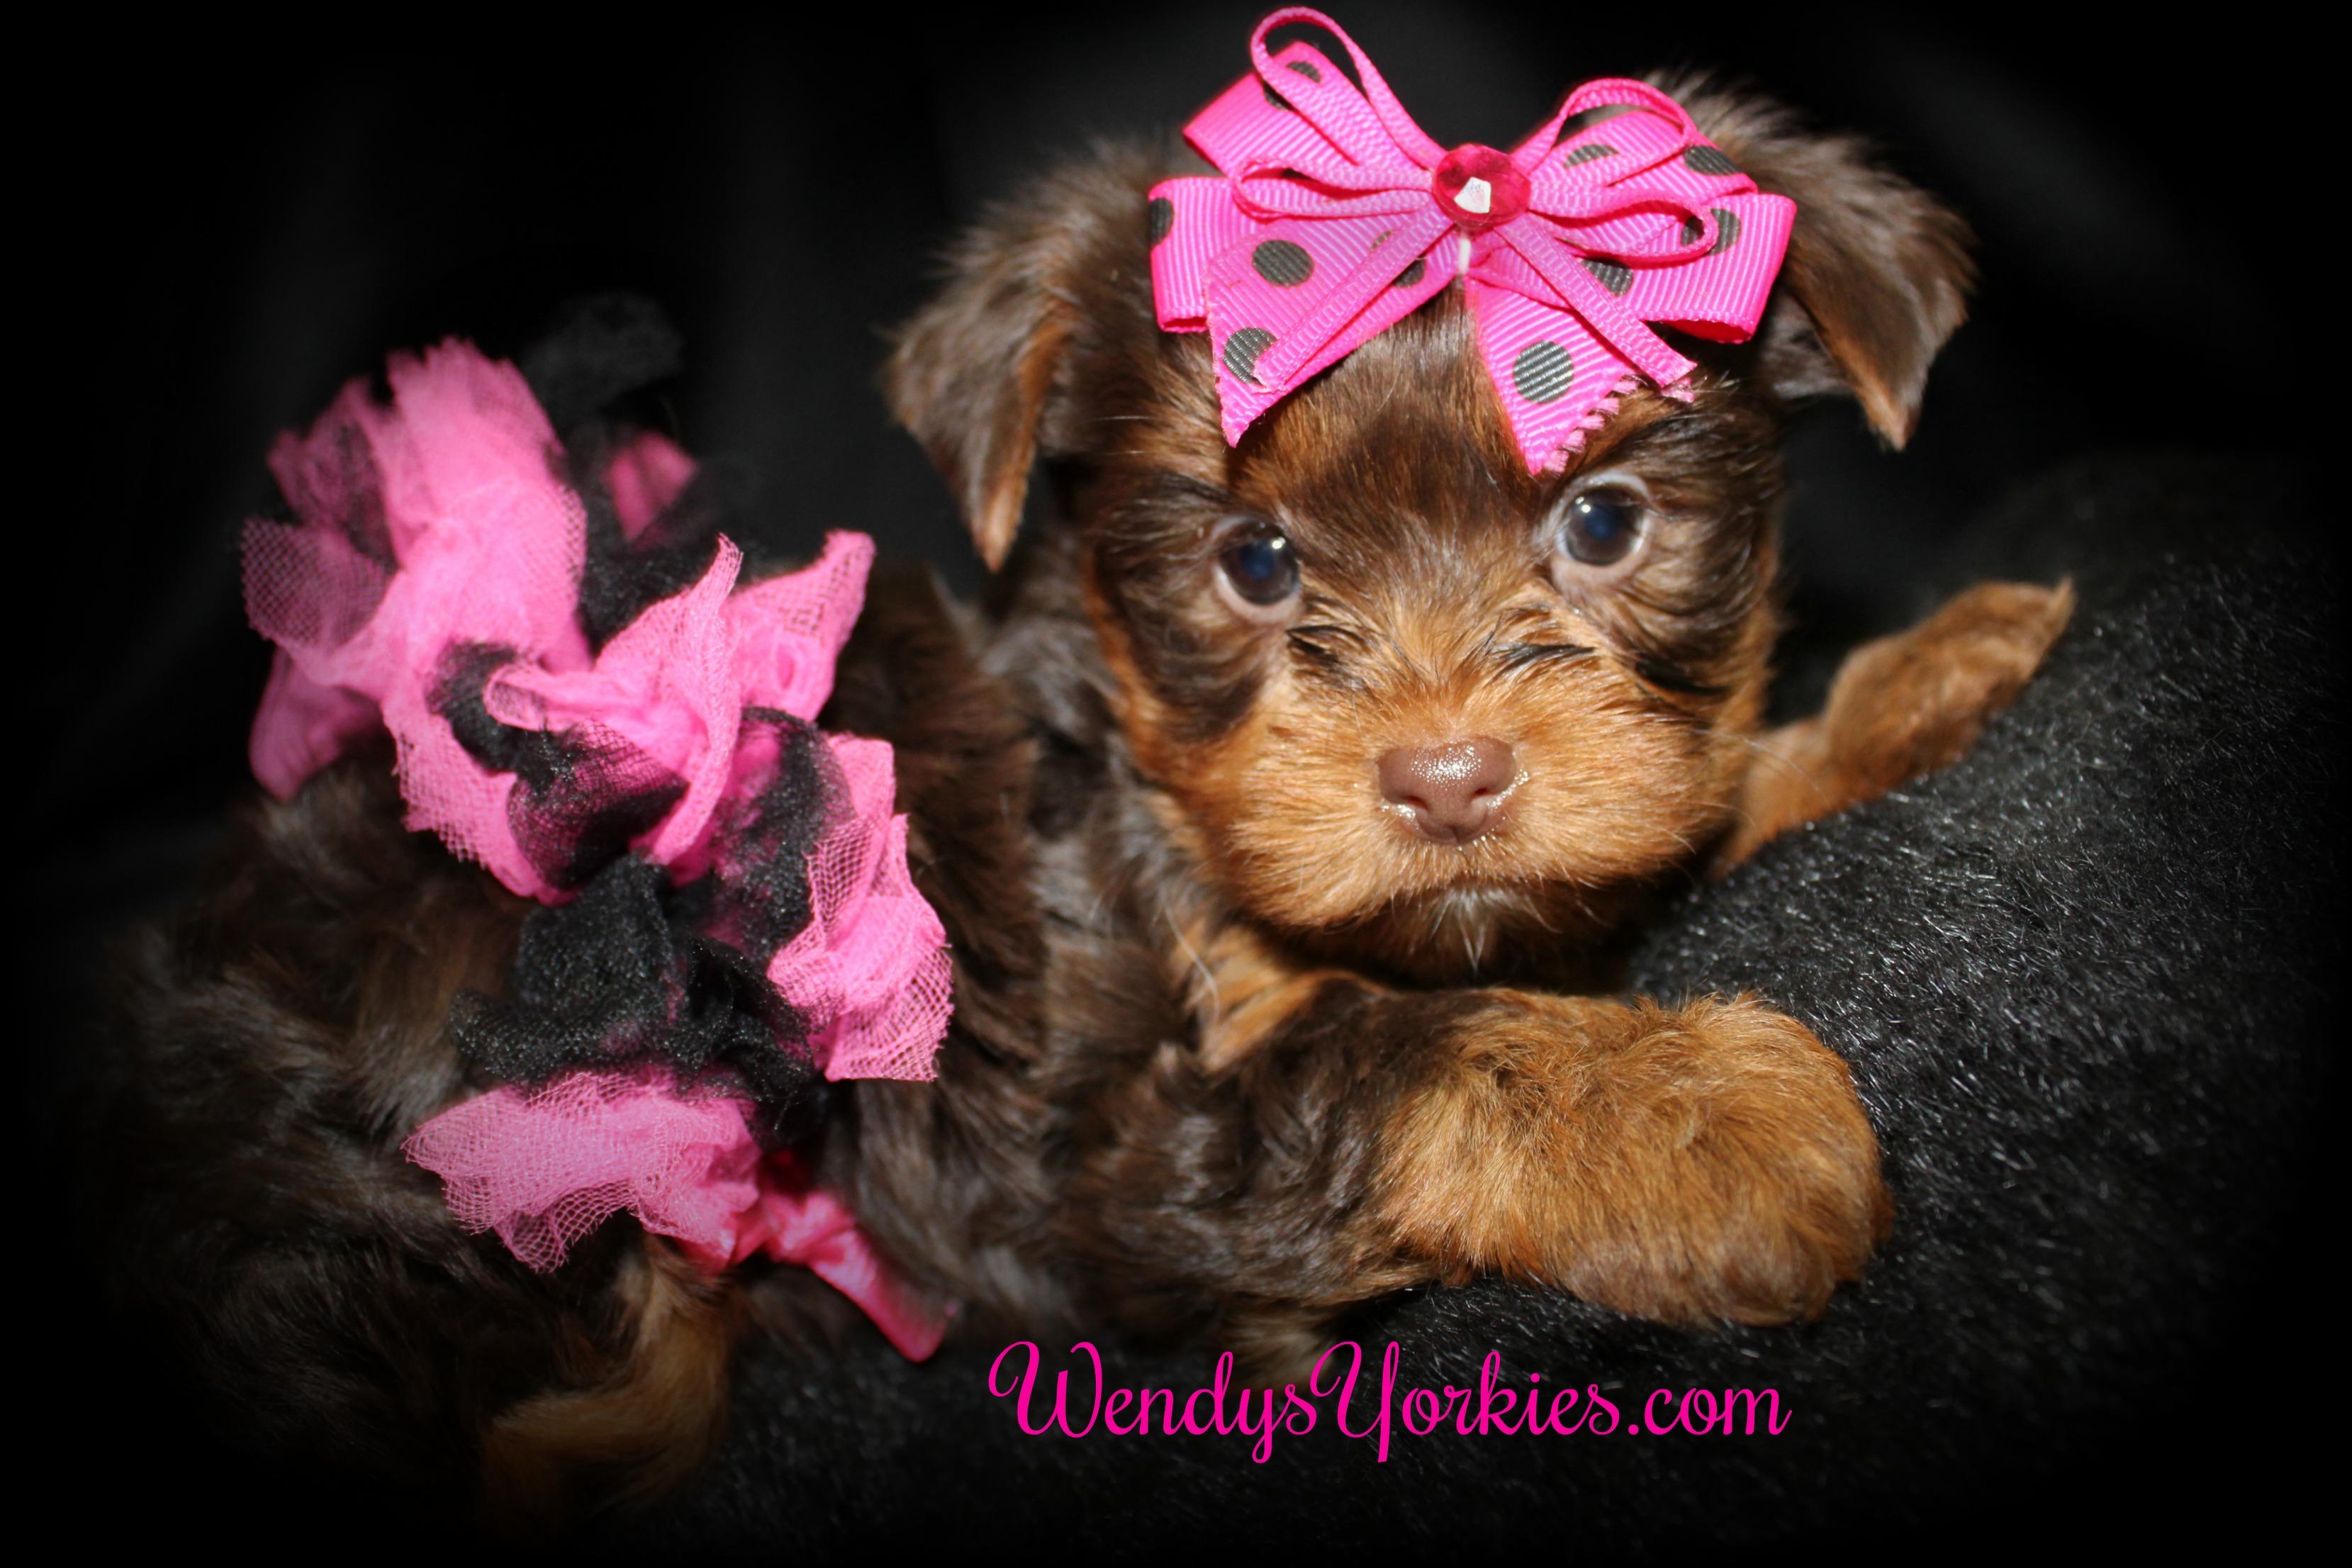 Toy Chocolate Yorkie puppy for sale, WendysYorkies.com, Lela Cf1